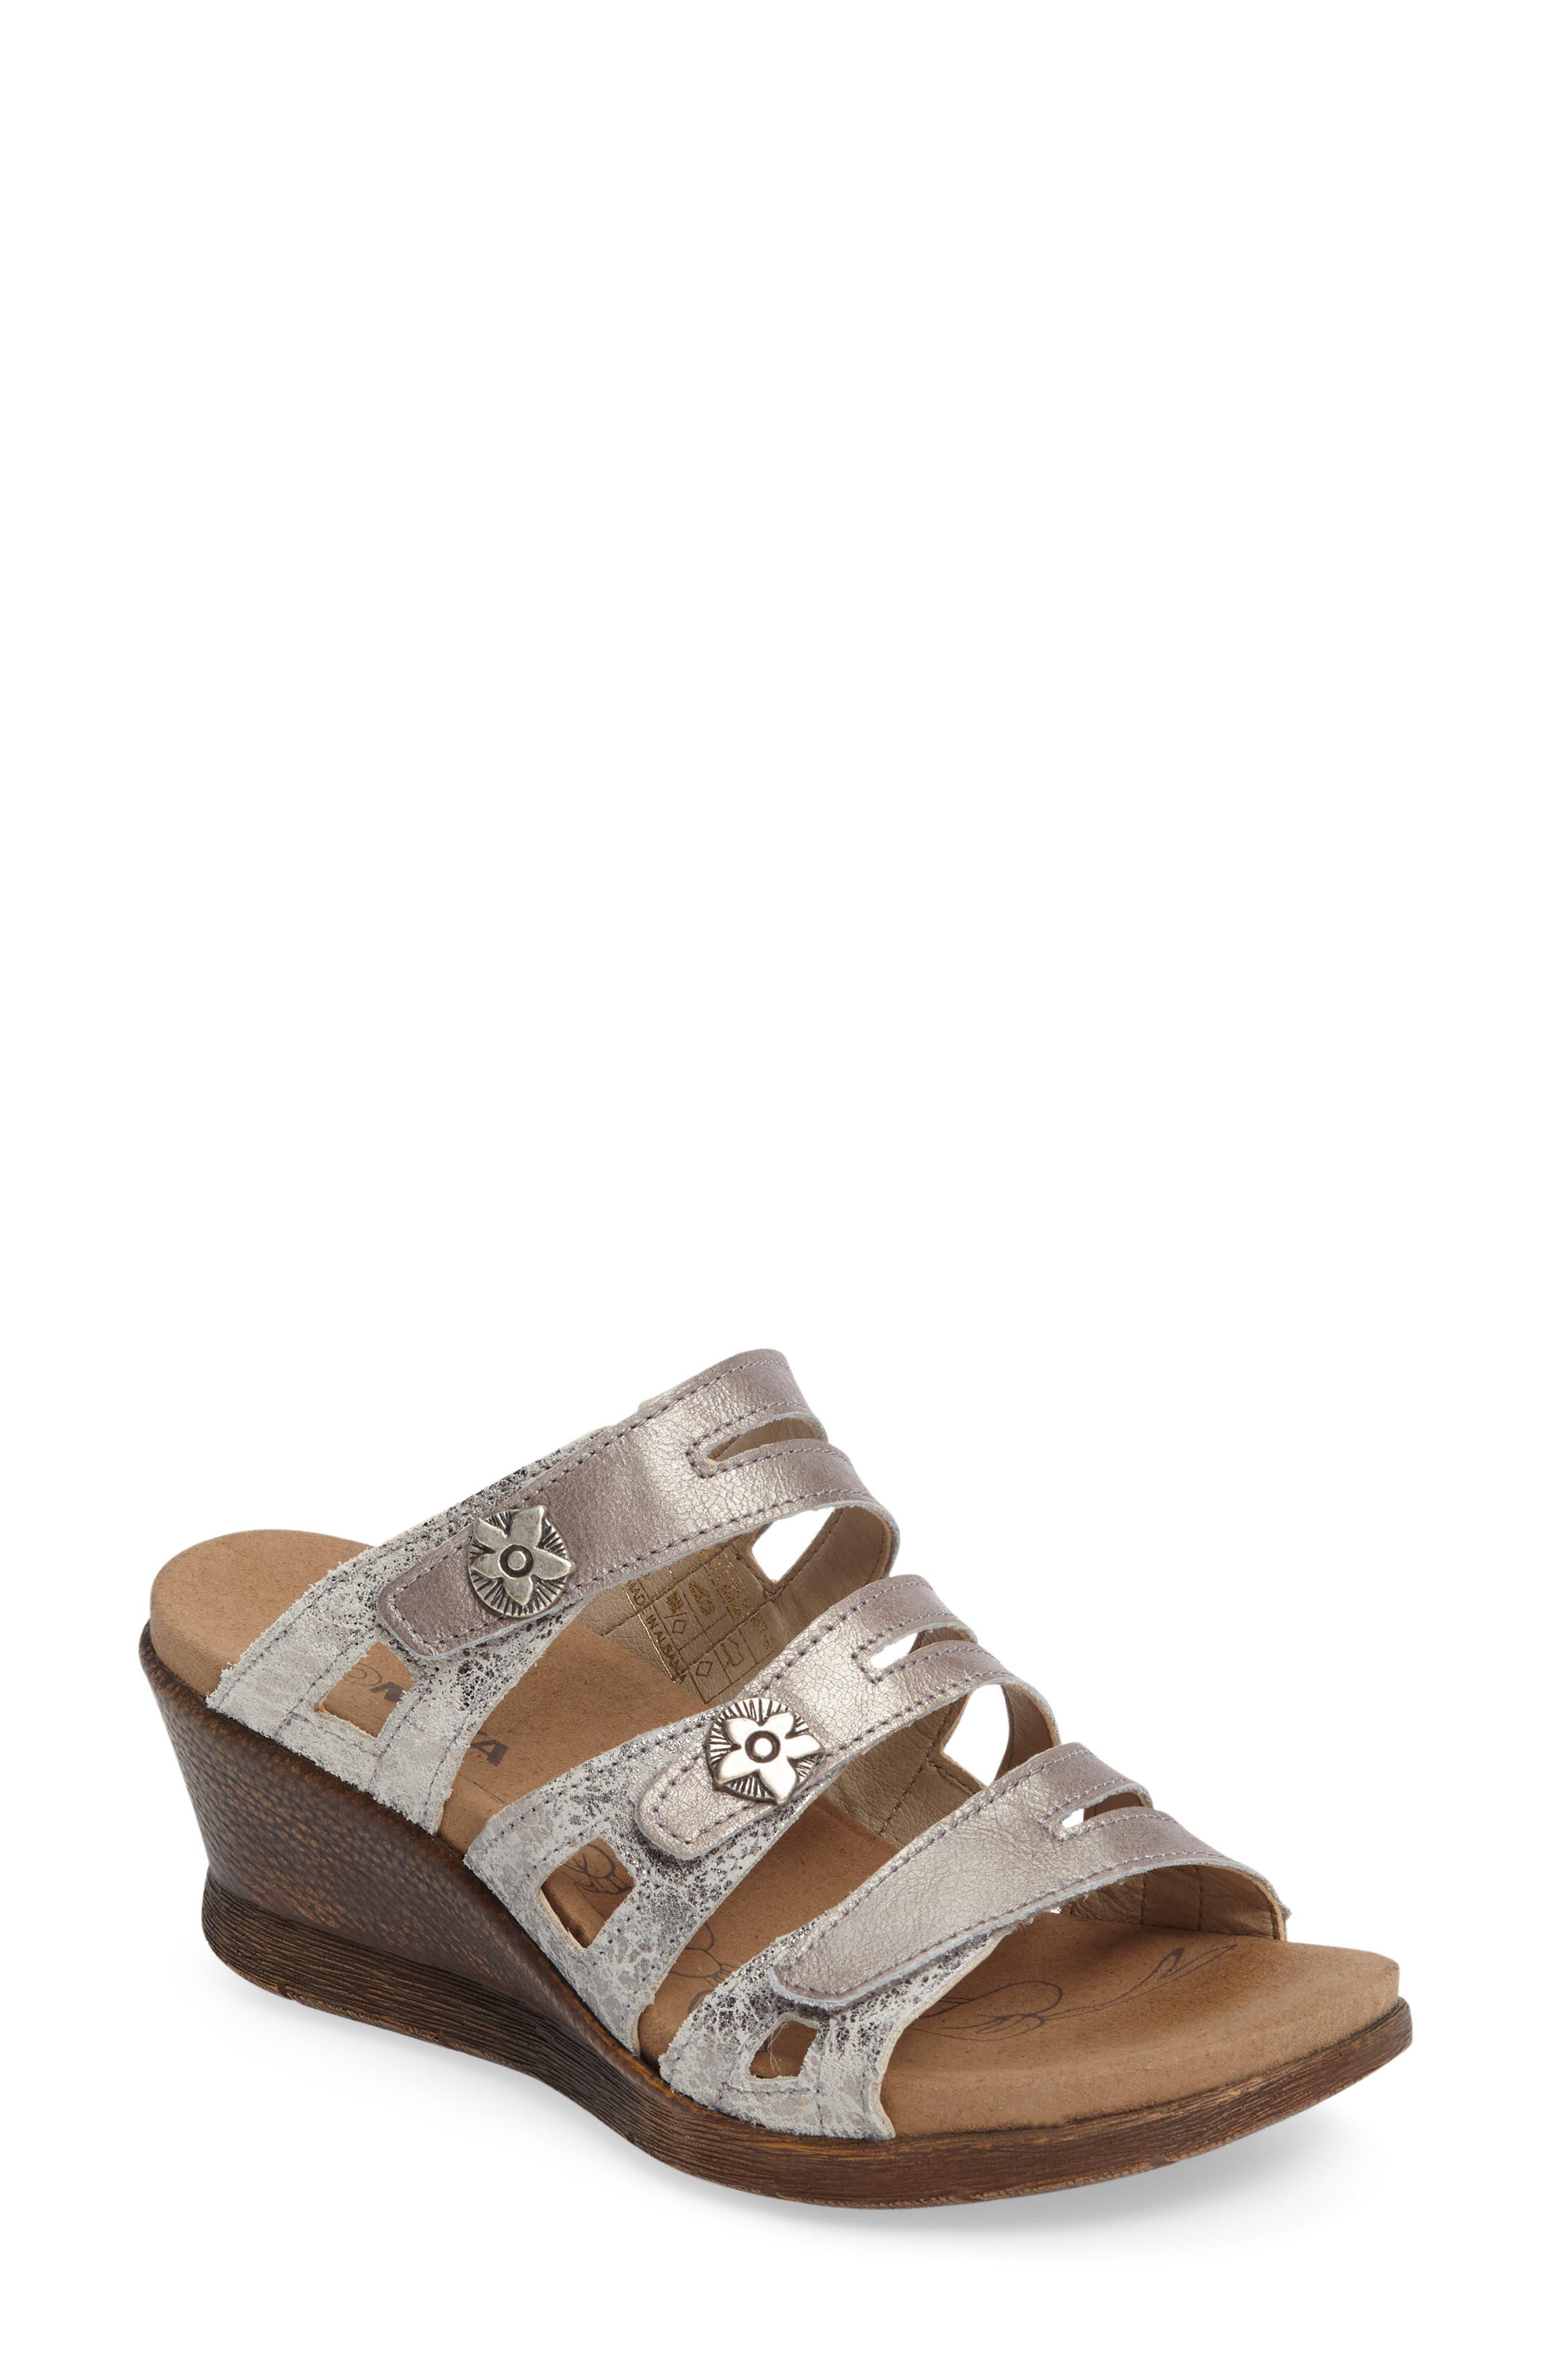 Nevis 04 Sandal,                             Main thumbnail 1, color,                             Platin Leather